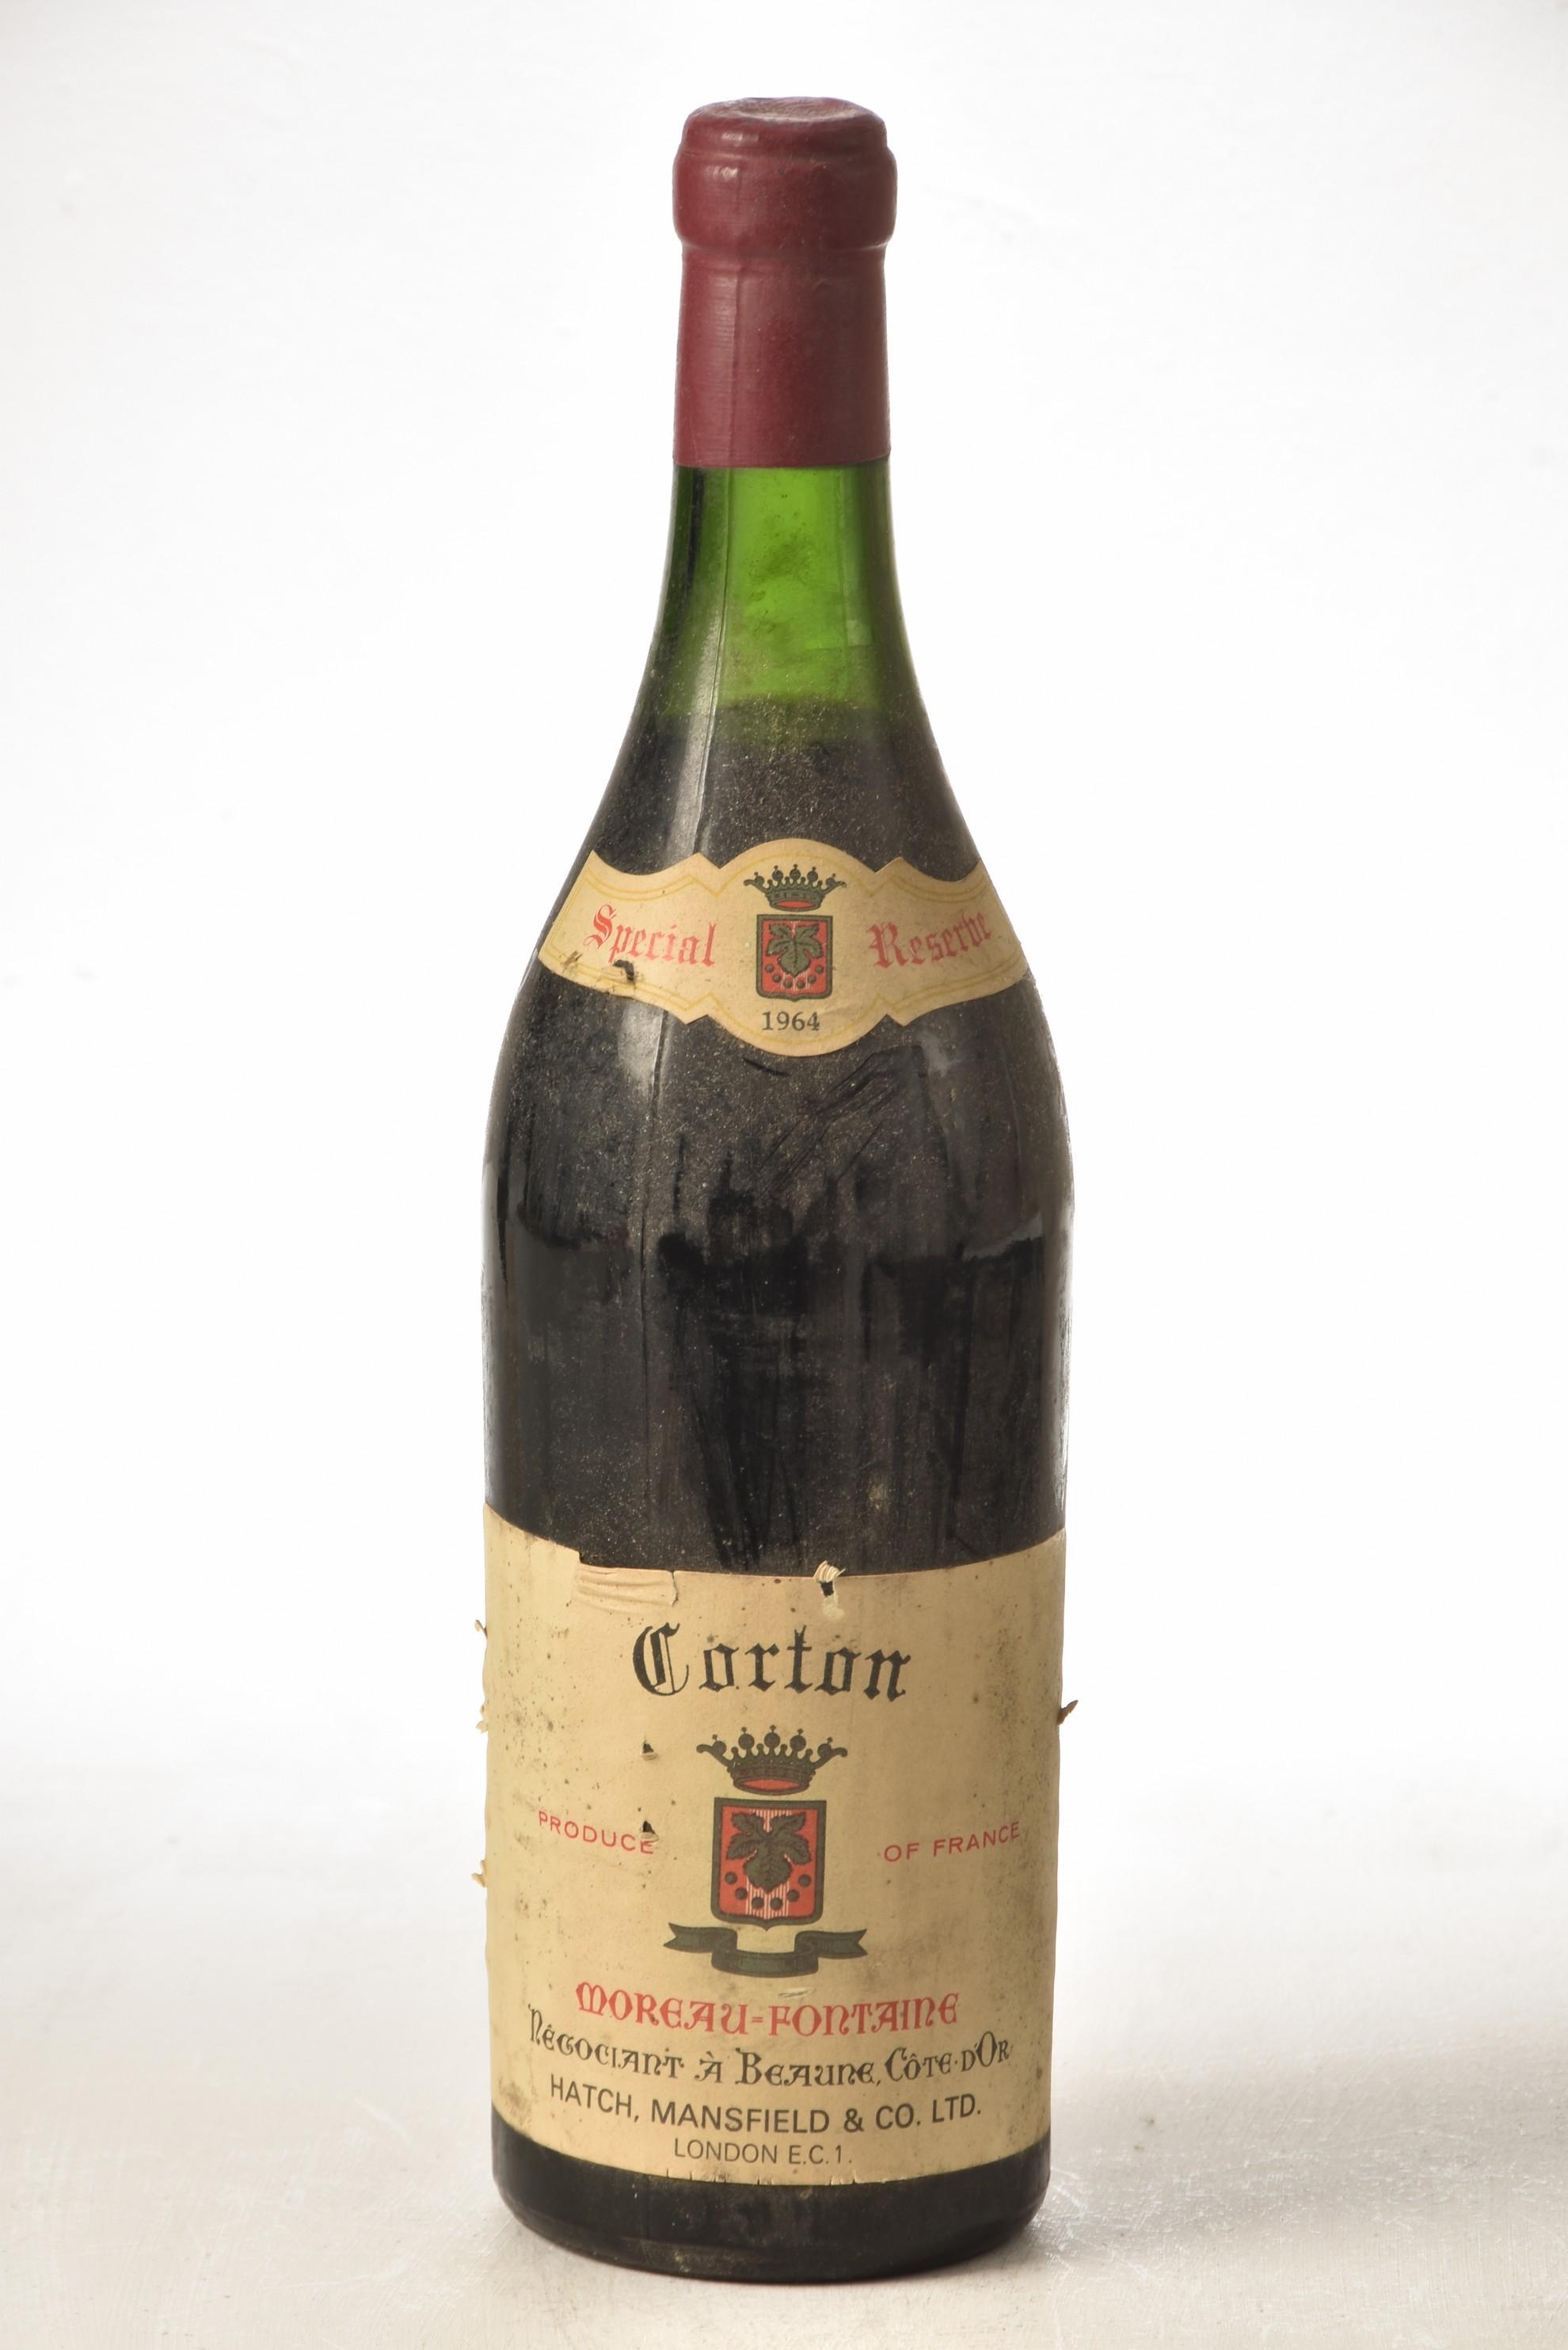 Corton 1964 Moreau-Fontaine 1 bt